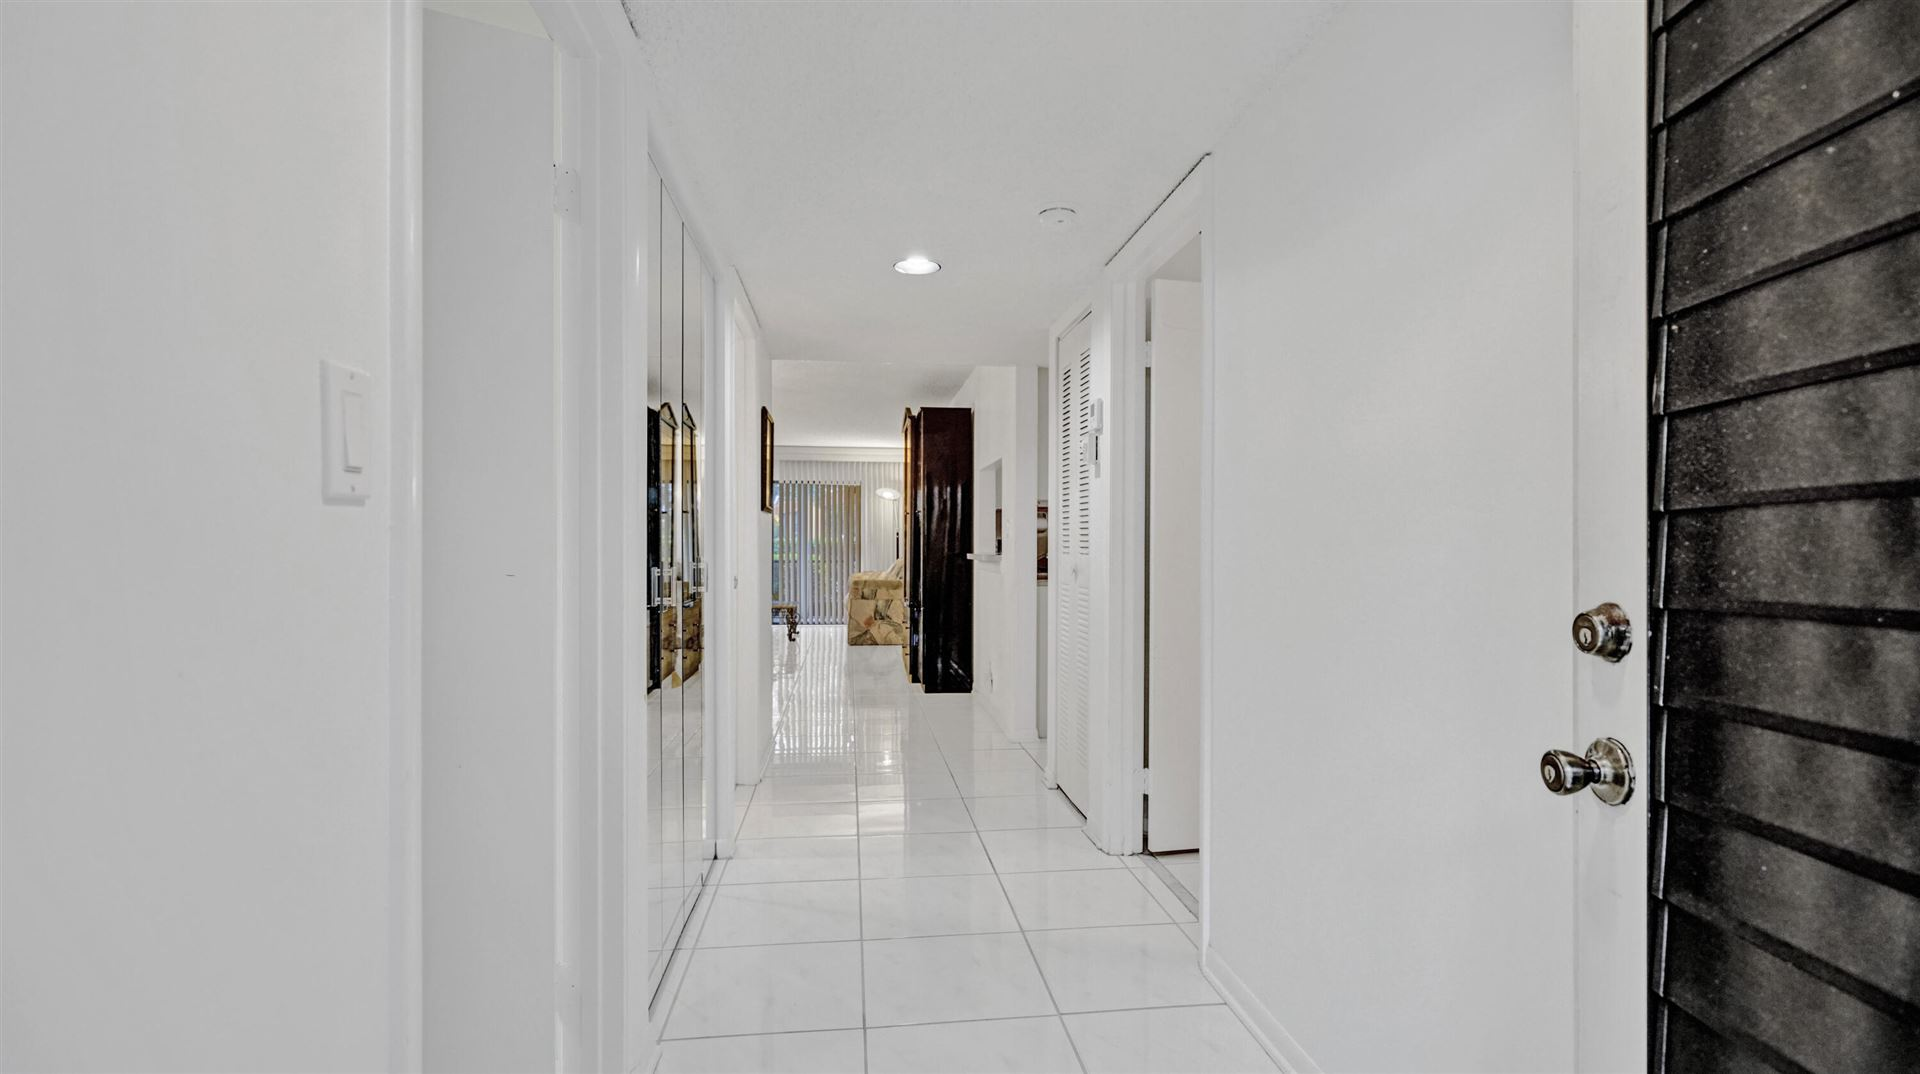 15301 Pembridge 48 Avenue #48, Delray Beach, FL 33484 - MLS#: RX-10754044